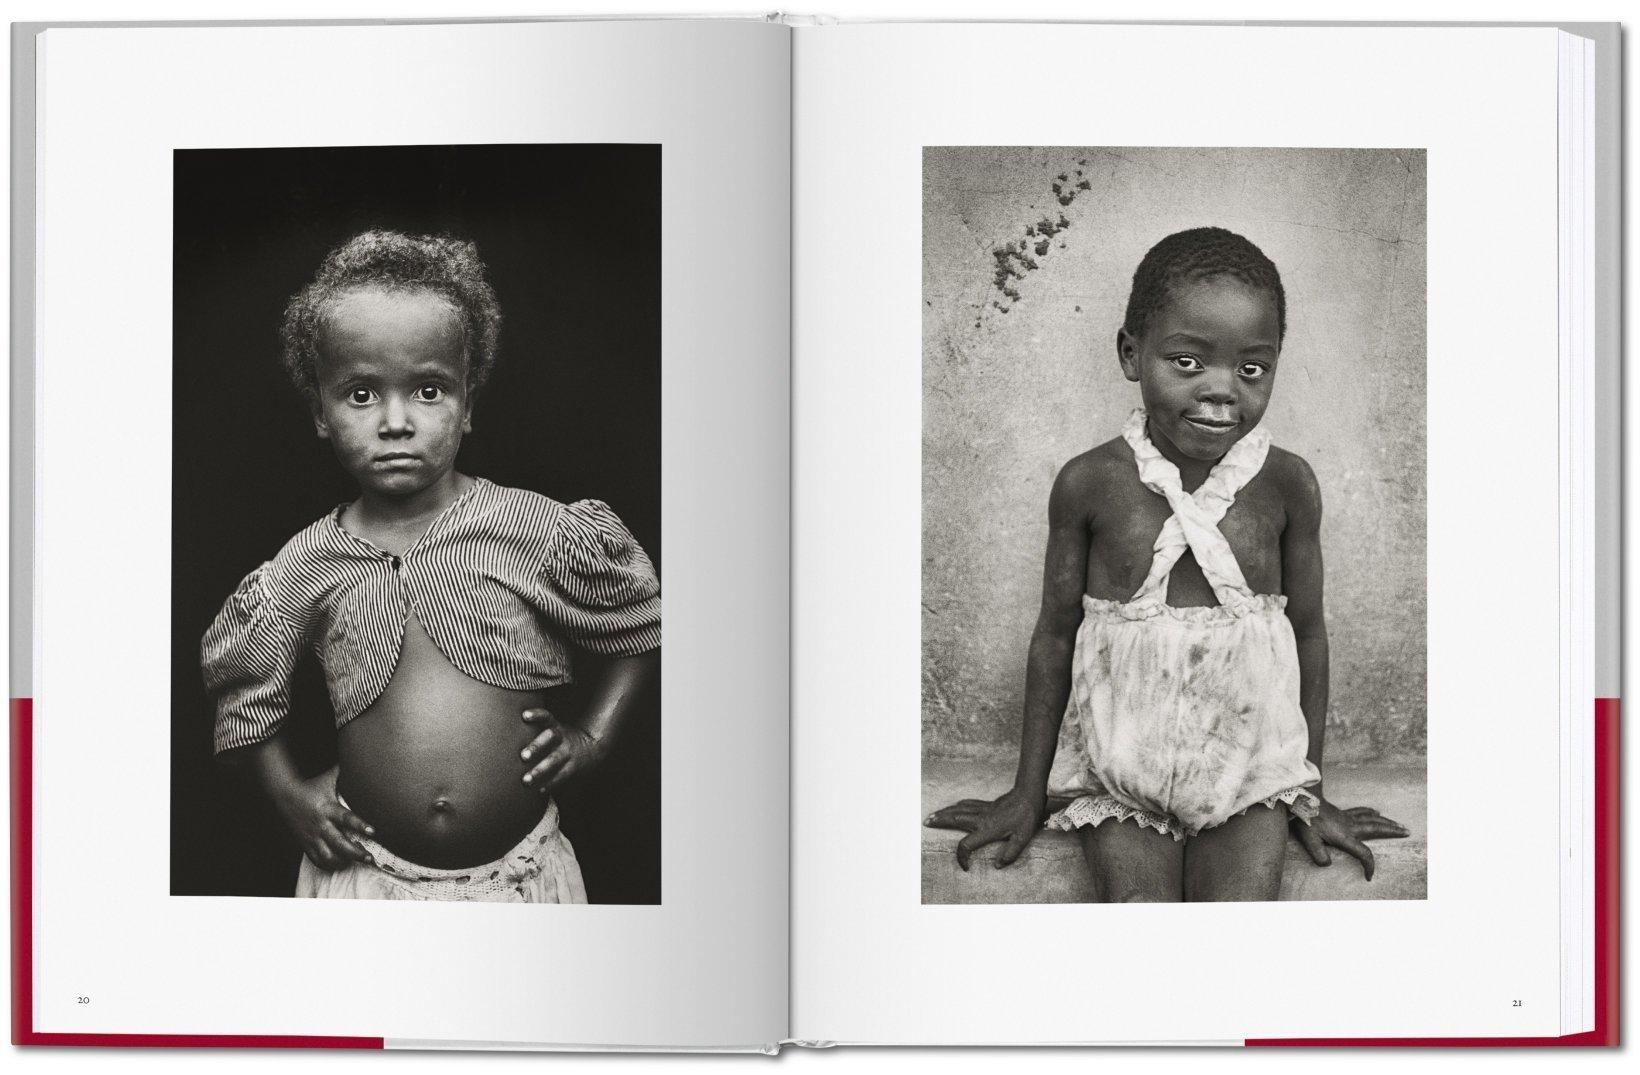 sebastiao salgado black and white photography